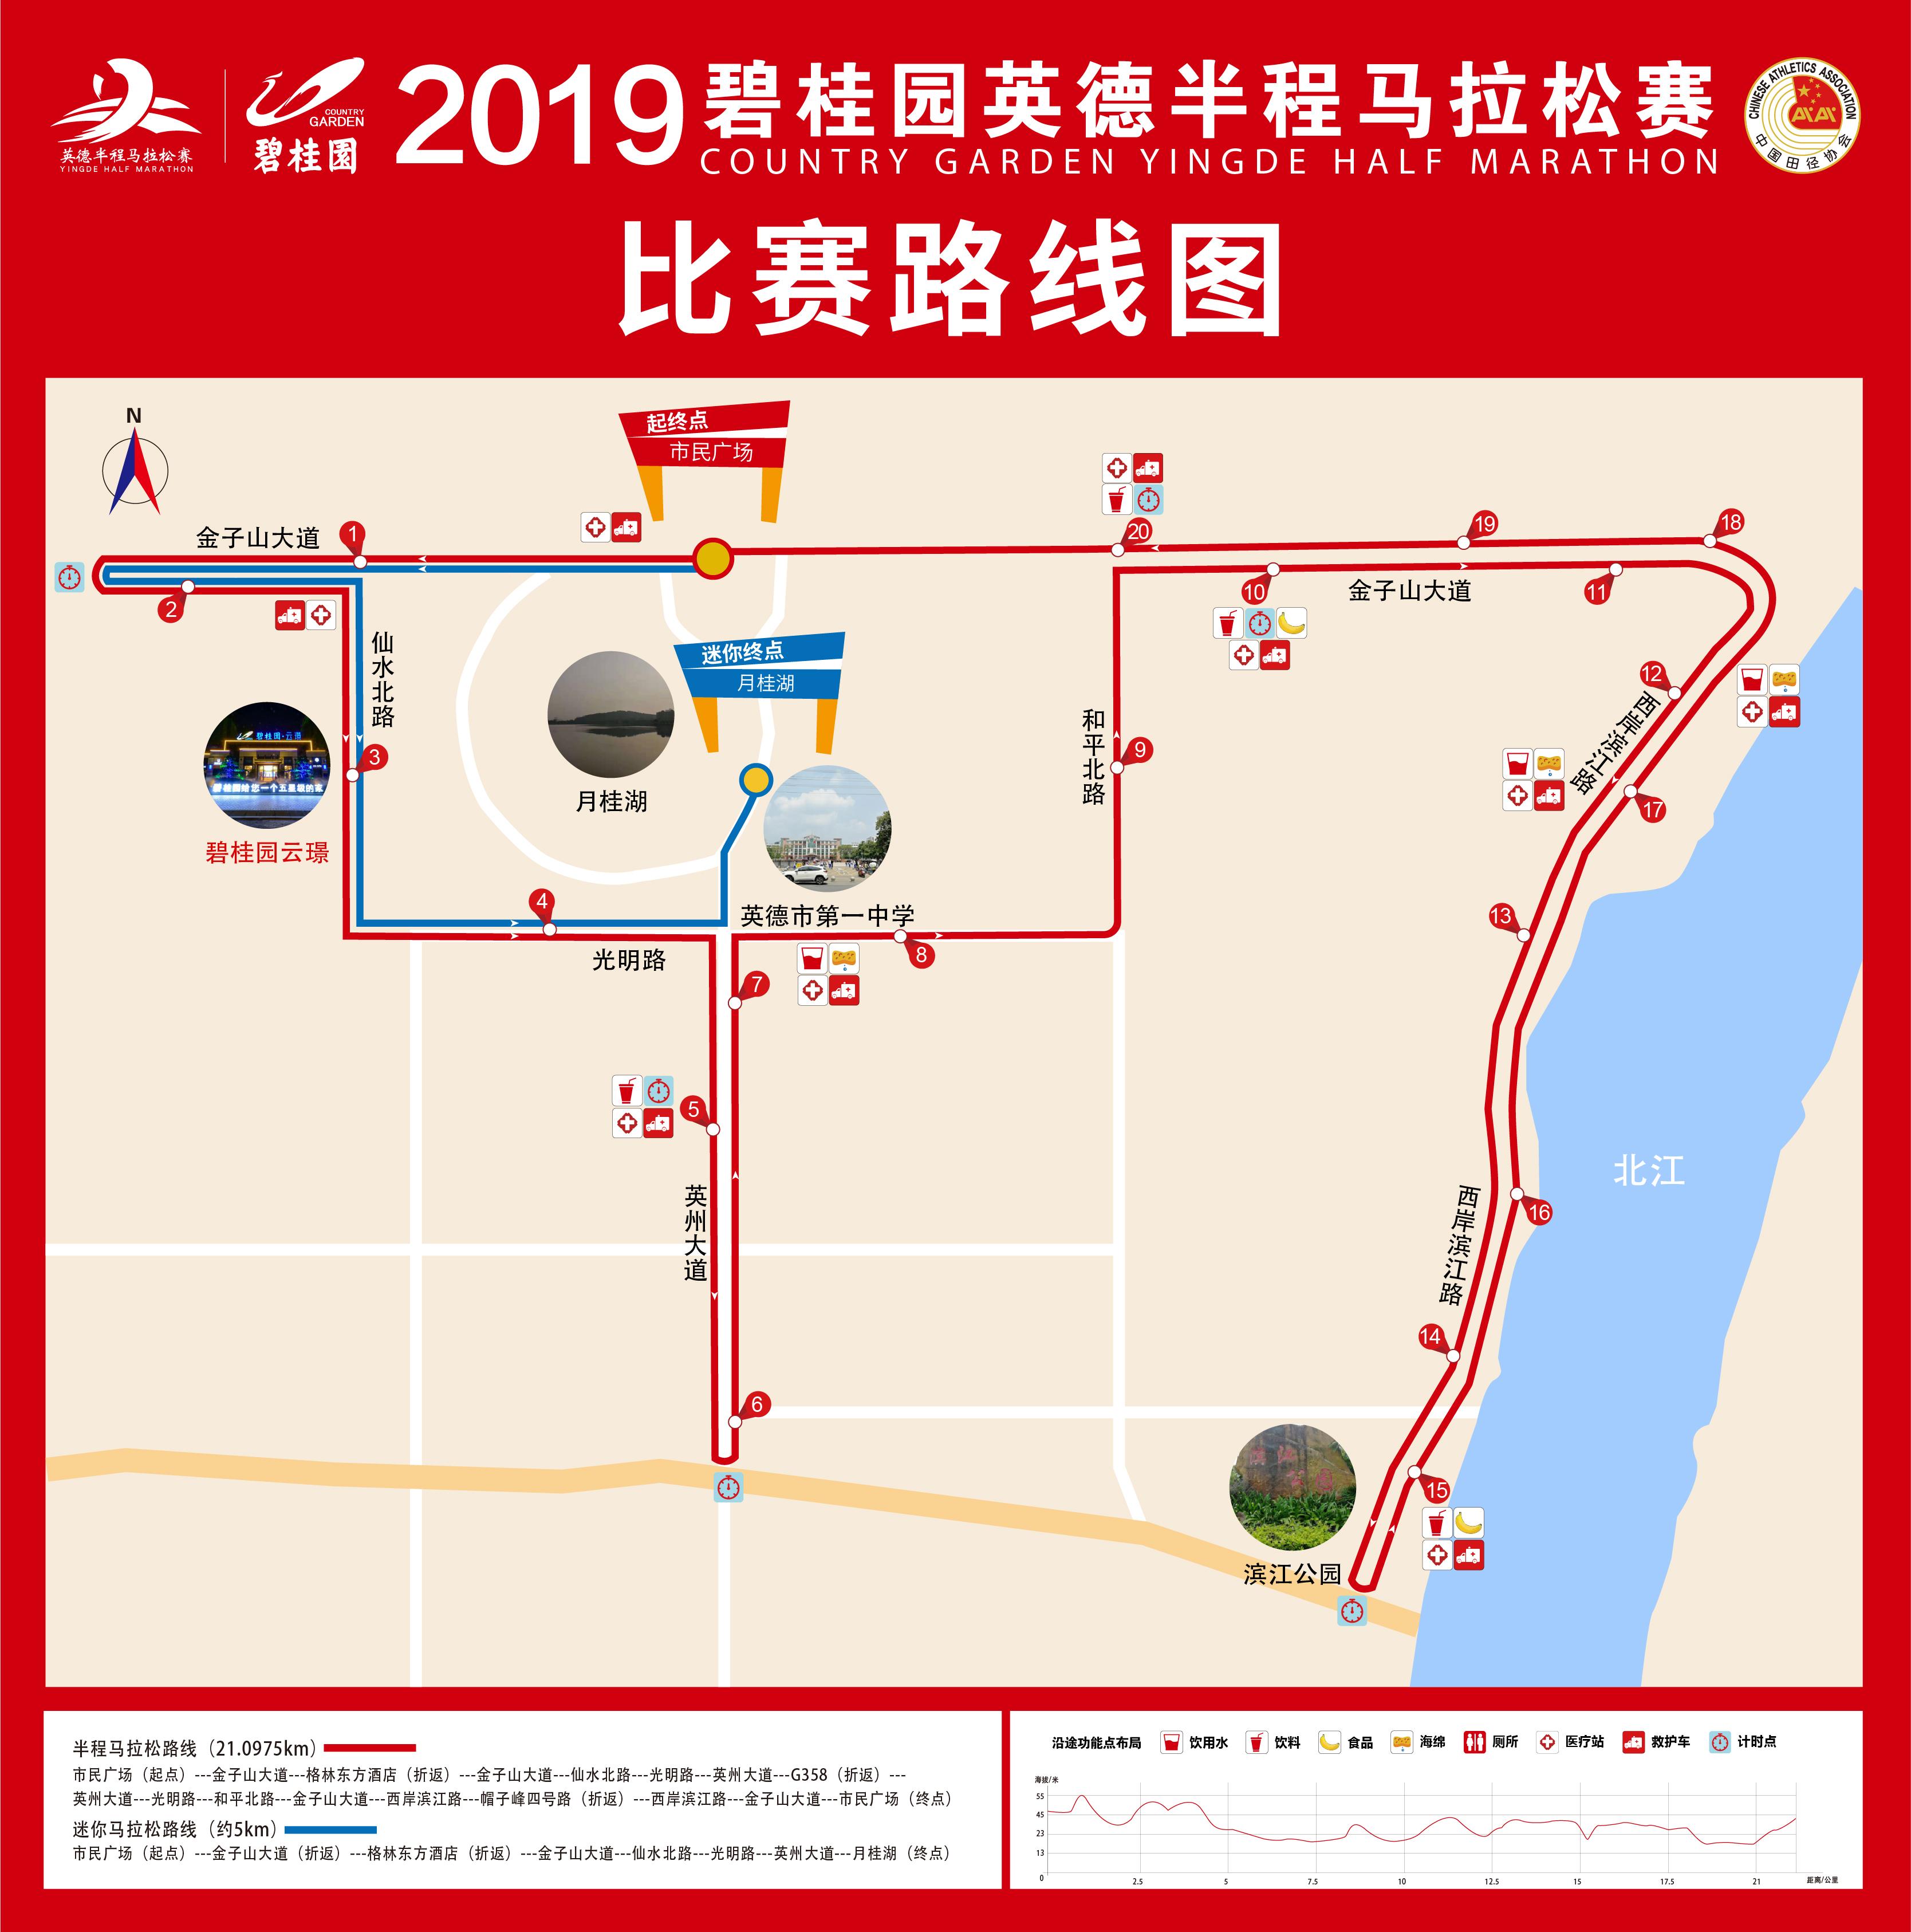 http://img.sport-china.cn/190926175d8c88792998c.jpeg